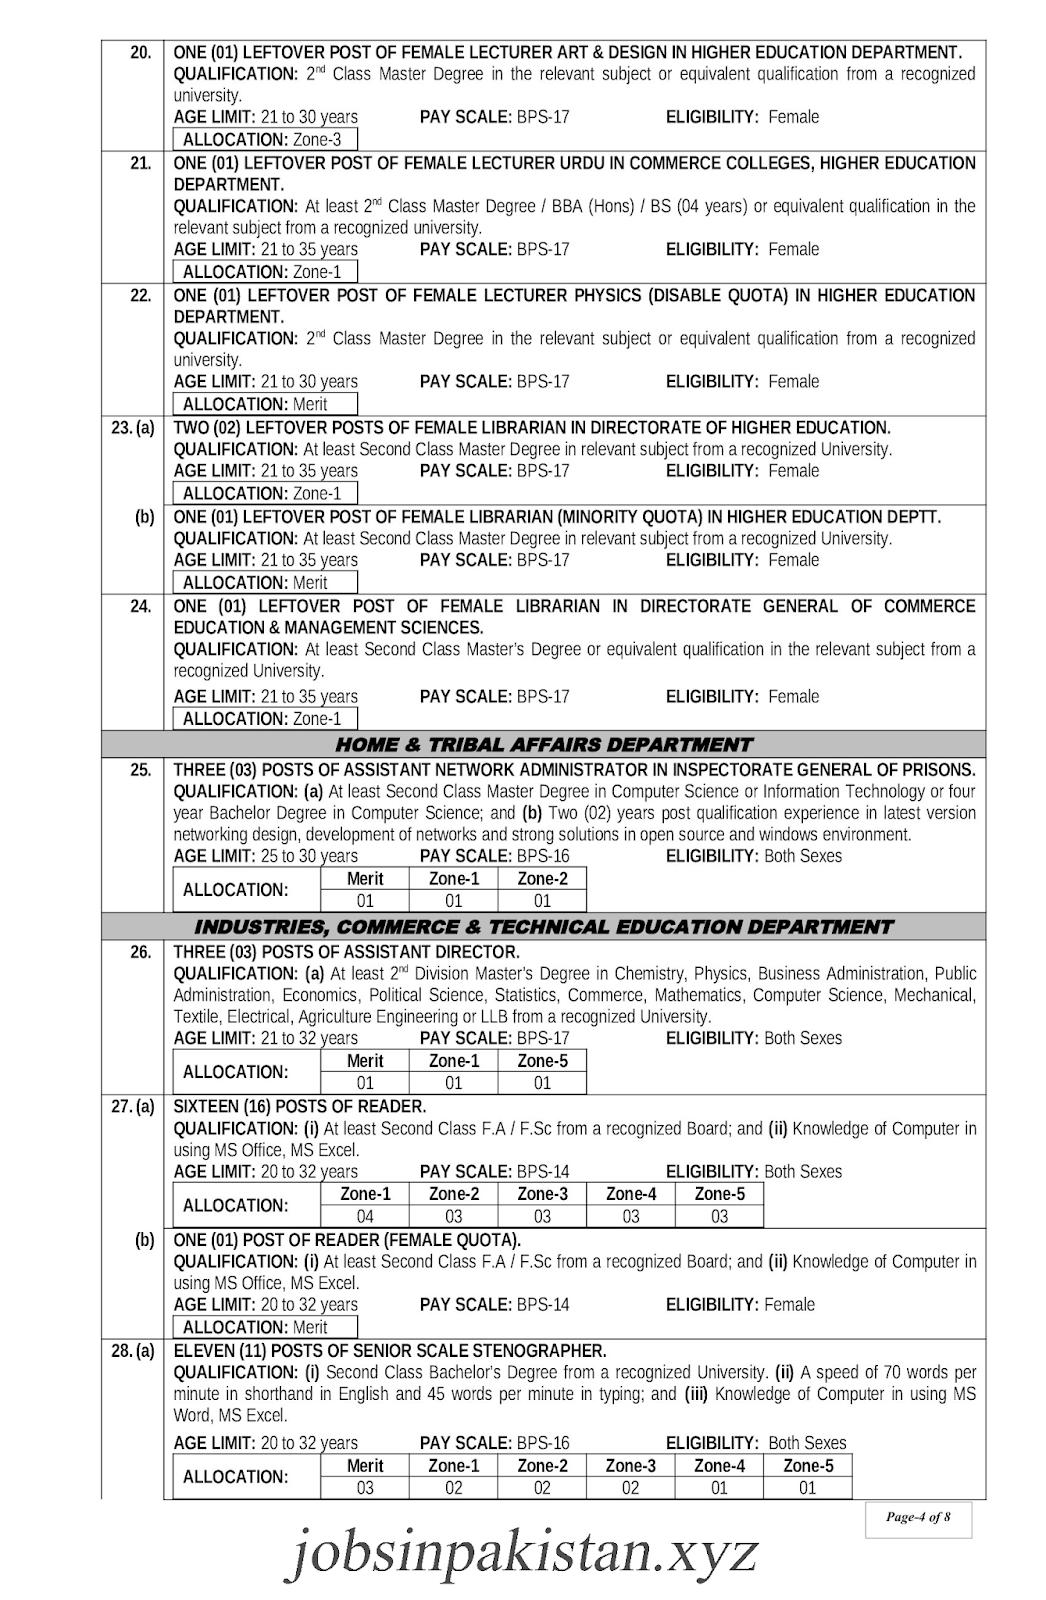 KPPSC Advertisement 08/2018 Page No. 4/8